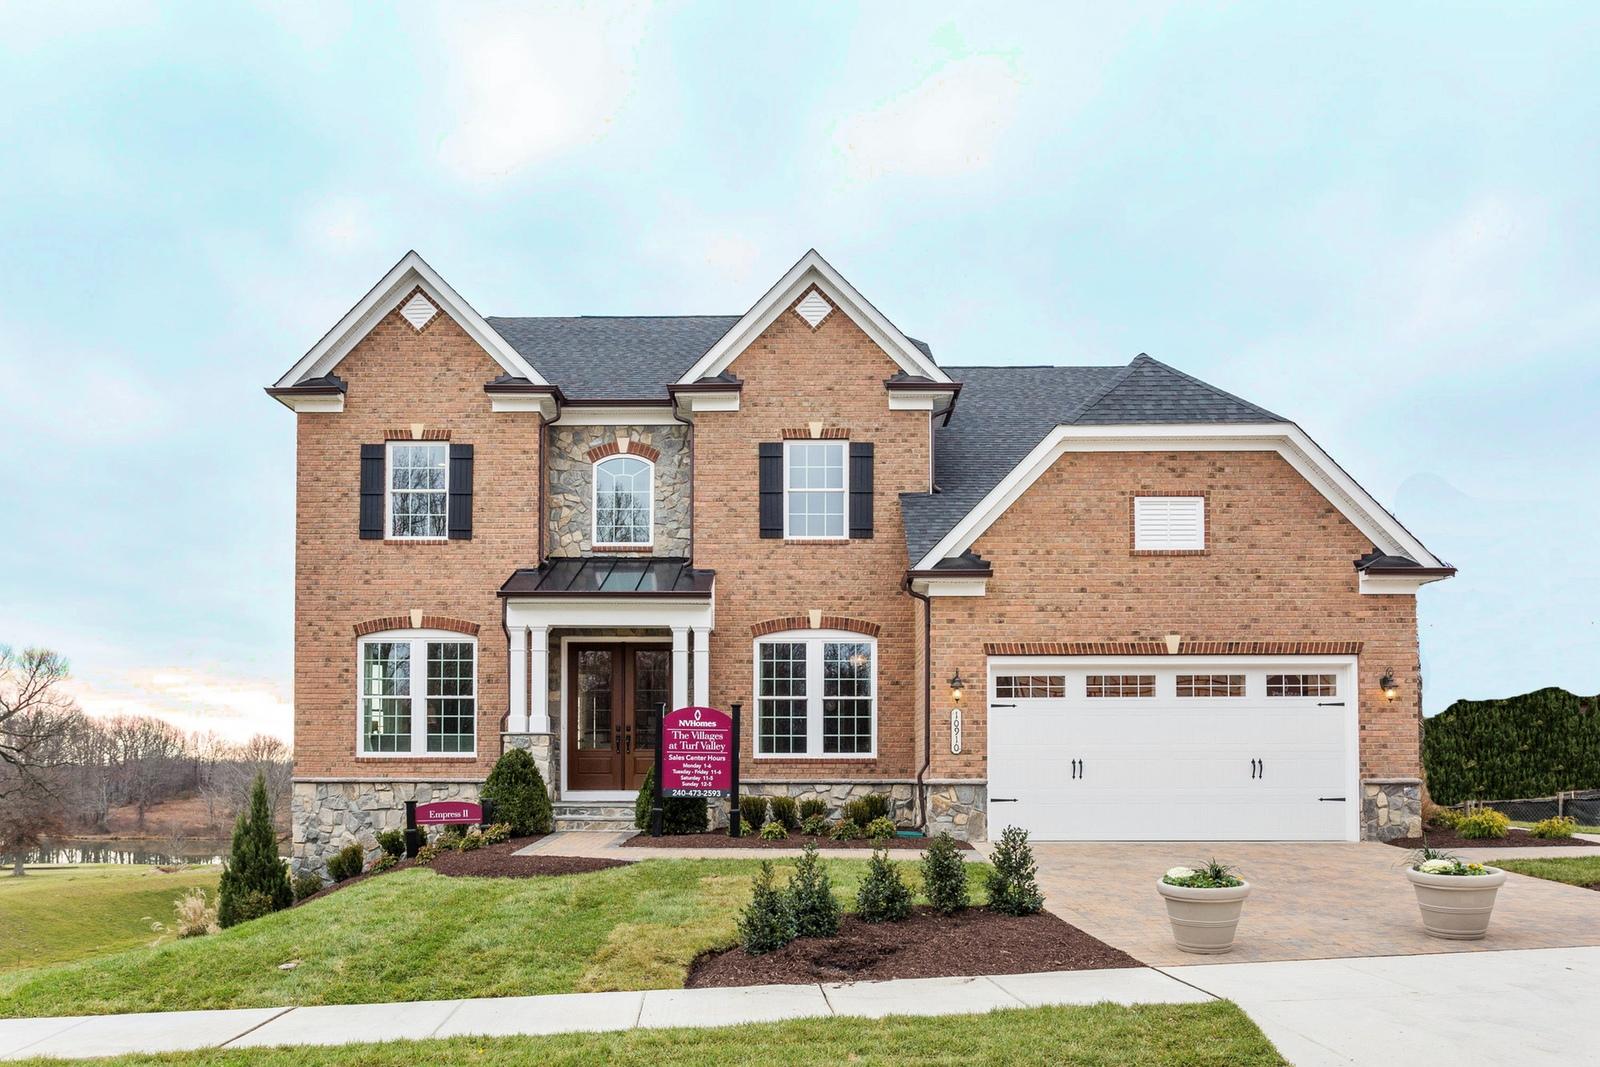 New empress ii home model for sale nvhomes for Dogwood homes